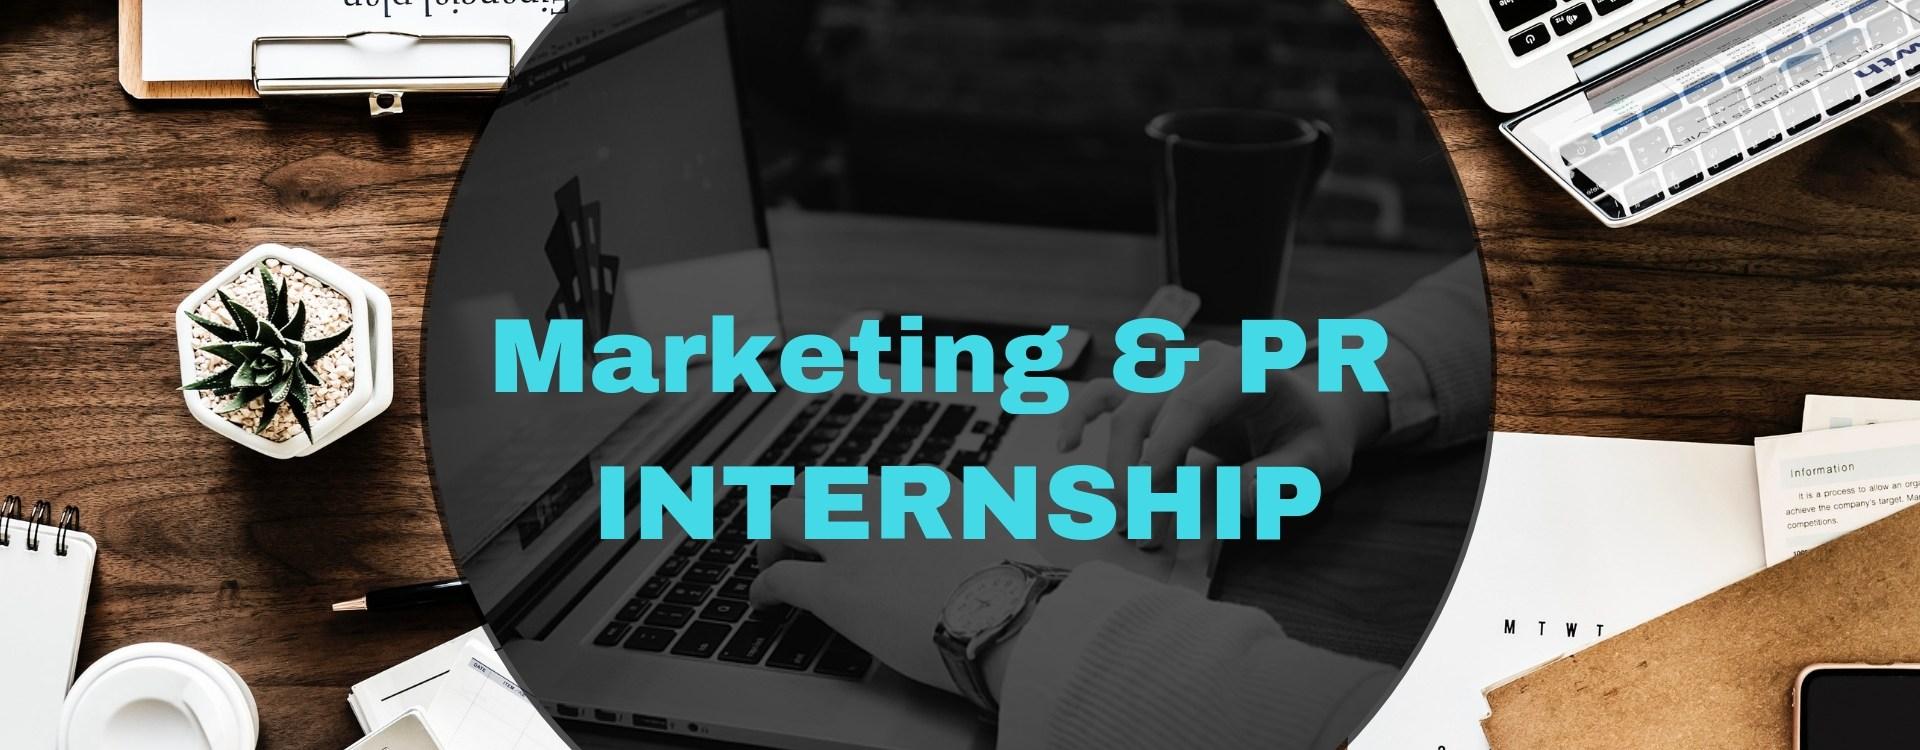 internship marketing cluj